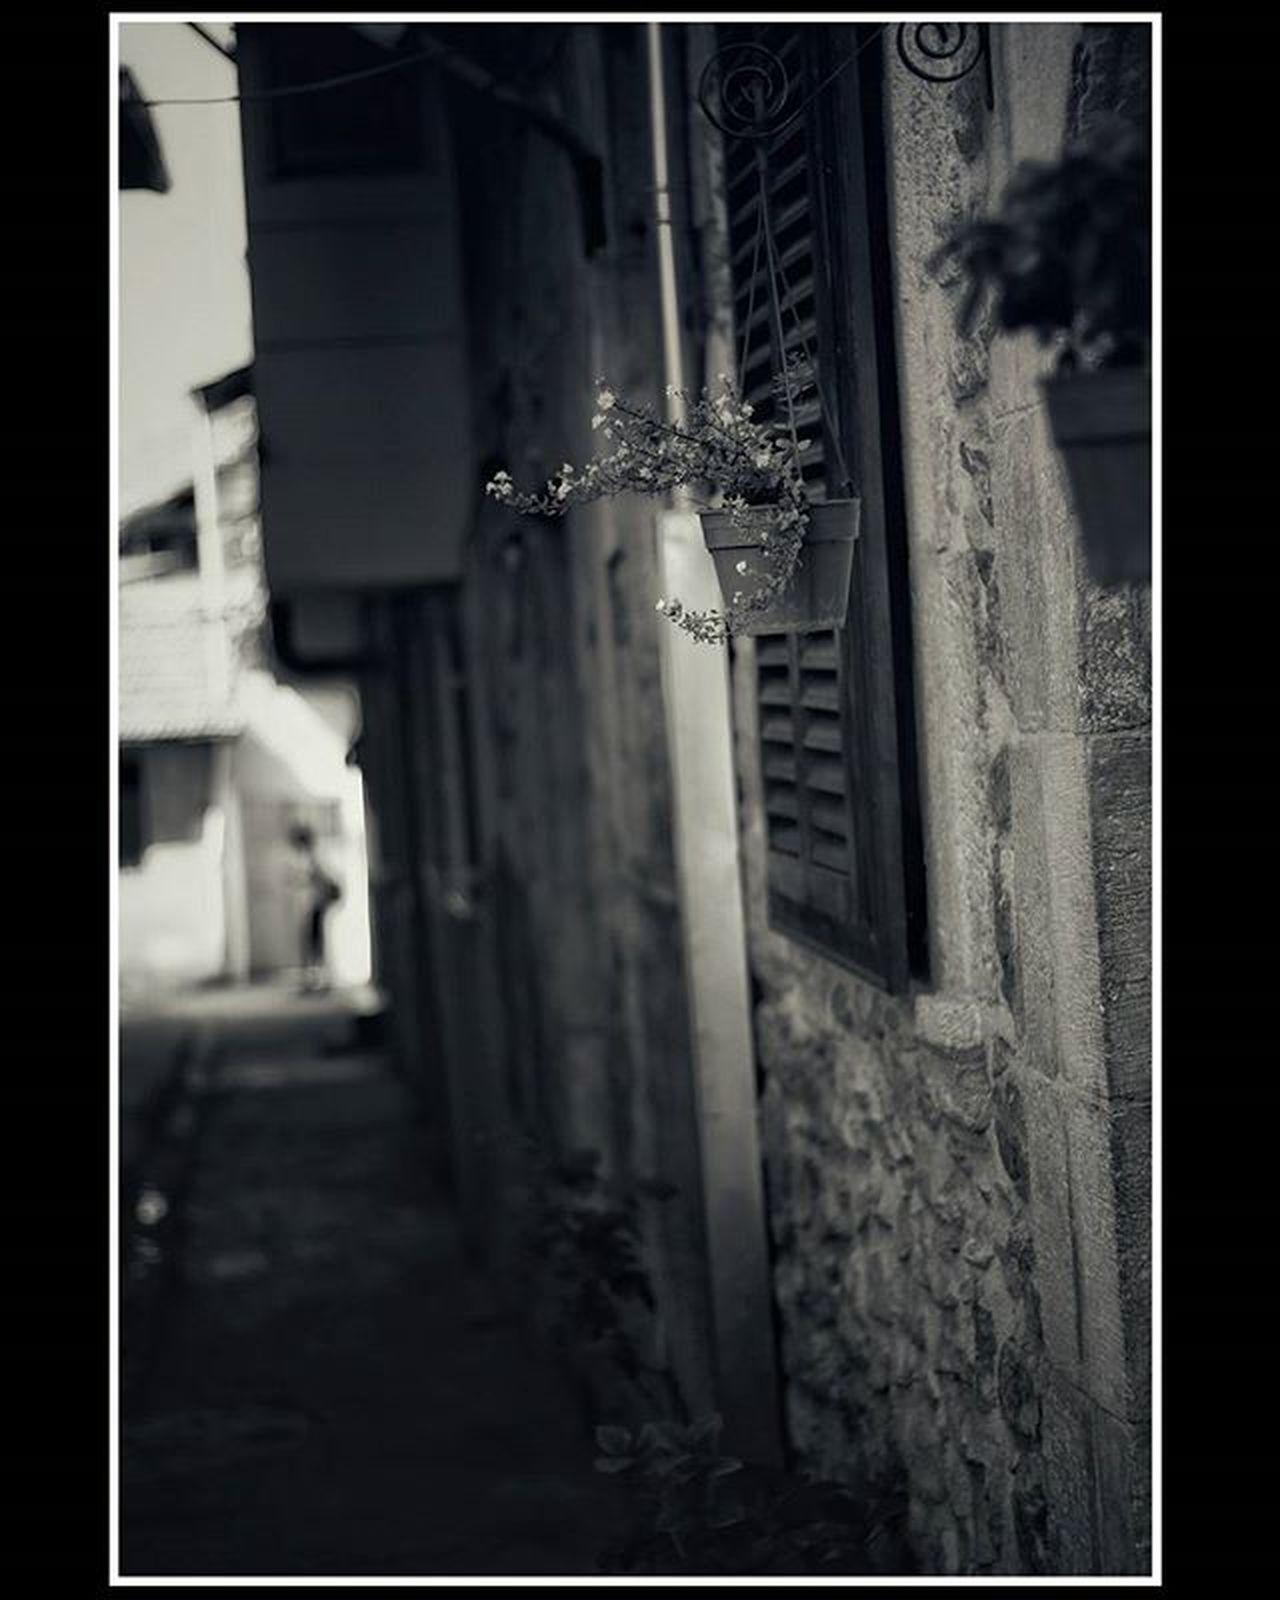 bazen renge gerek olmaz... Monochromatic MonochromePhotography Monochrome Blackandwhitephoto Bwphotography Siyahbeyazfoto Photohobycanokkali Photographercanokkali Canon Canon70d Canonphotography Antakya Hatay  Turkey Photooftheday